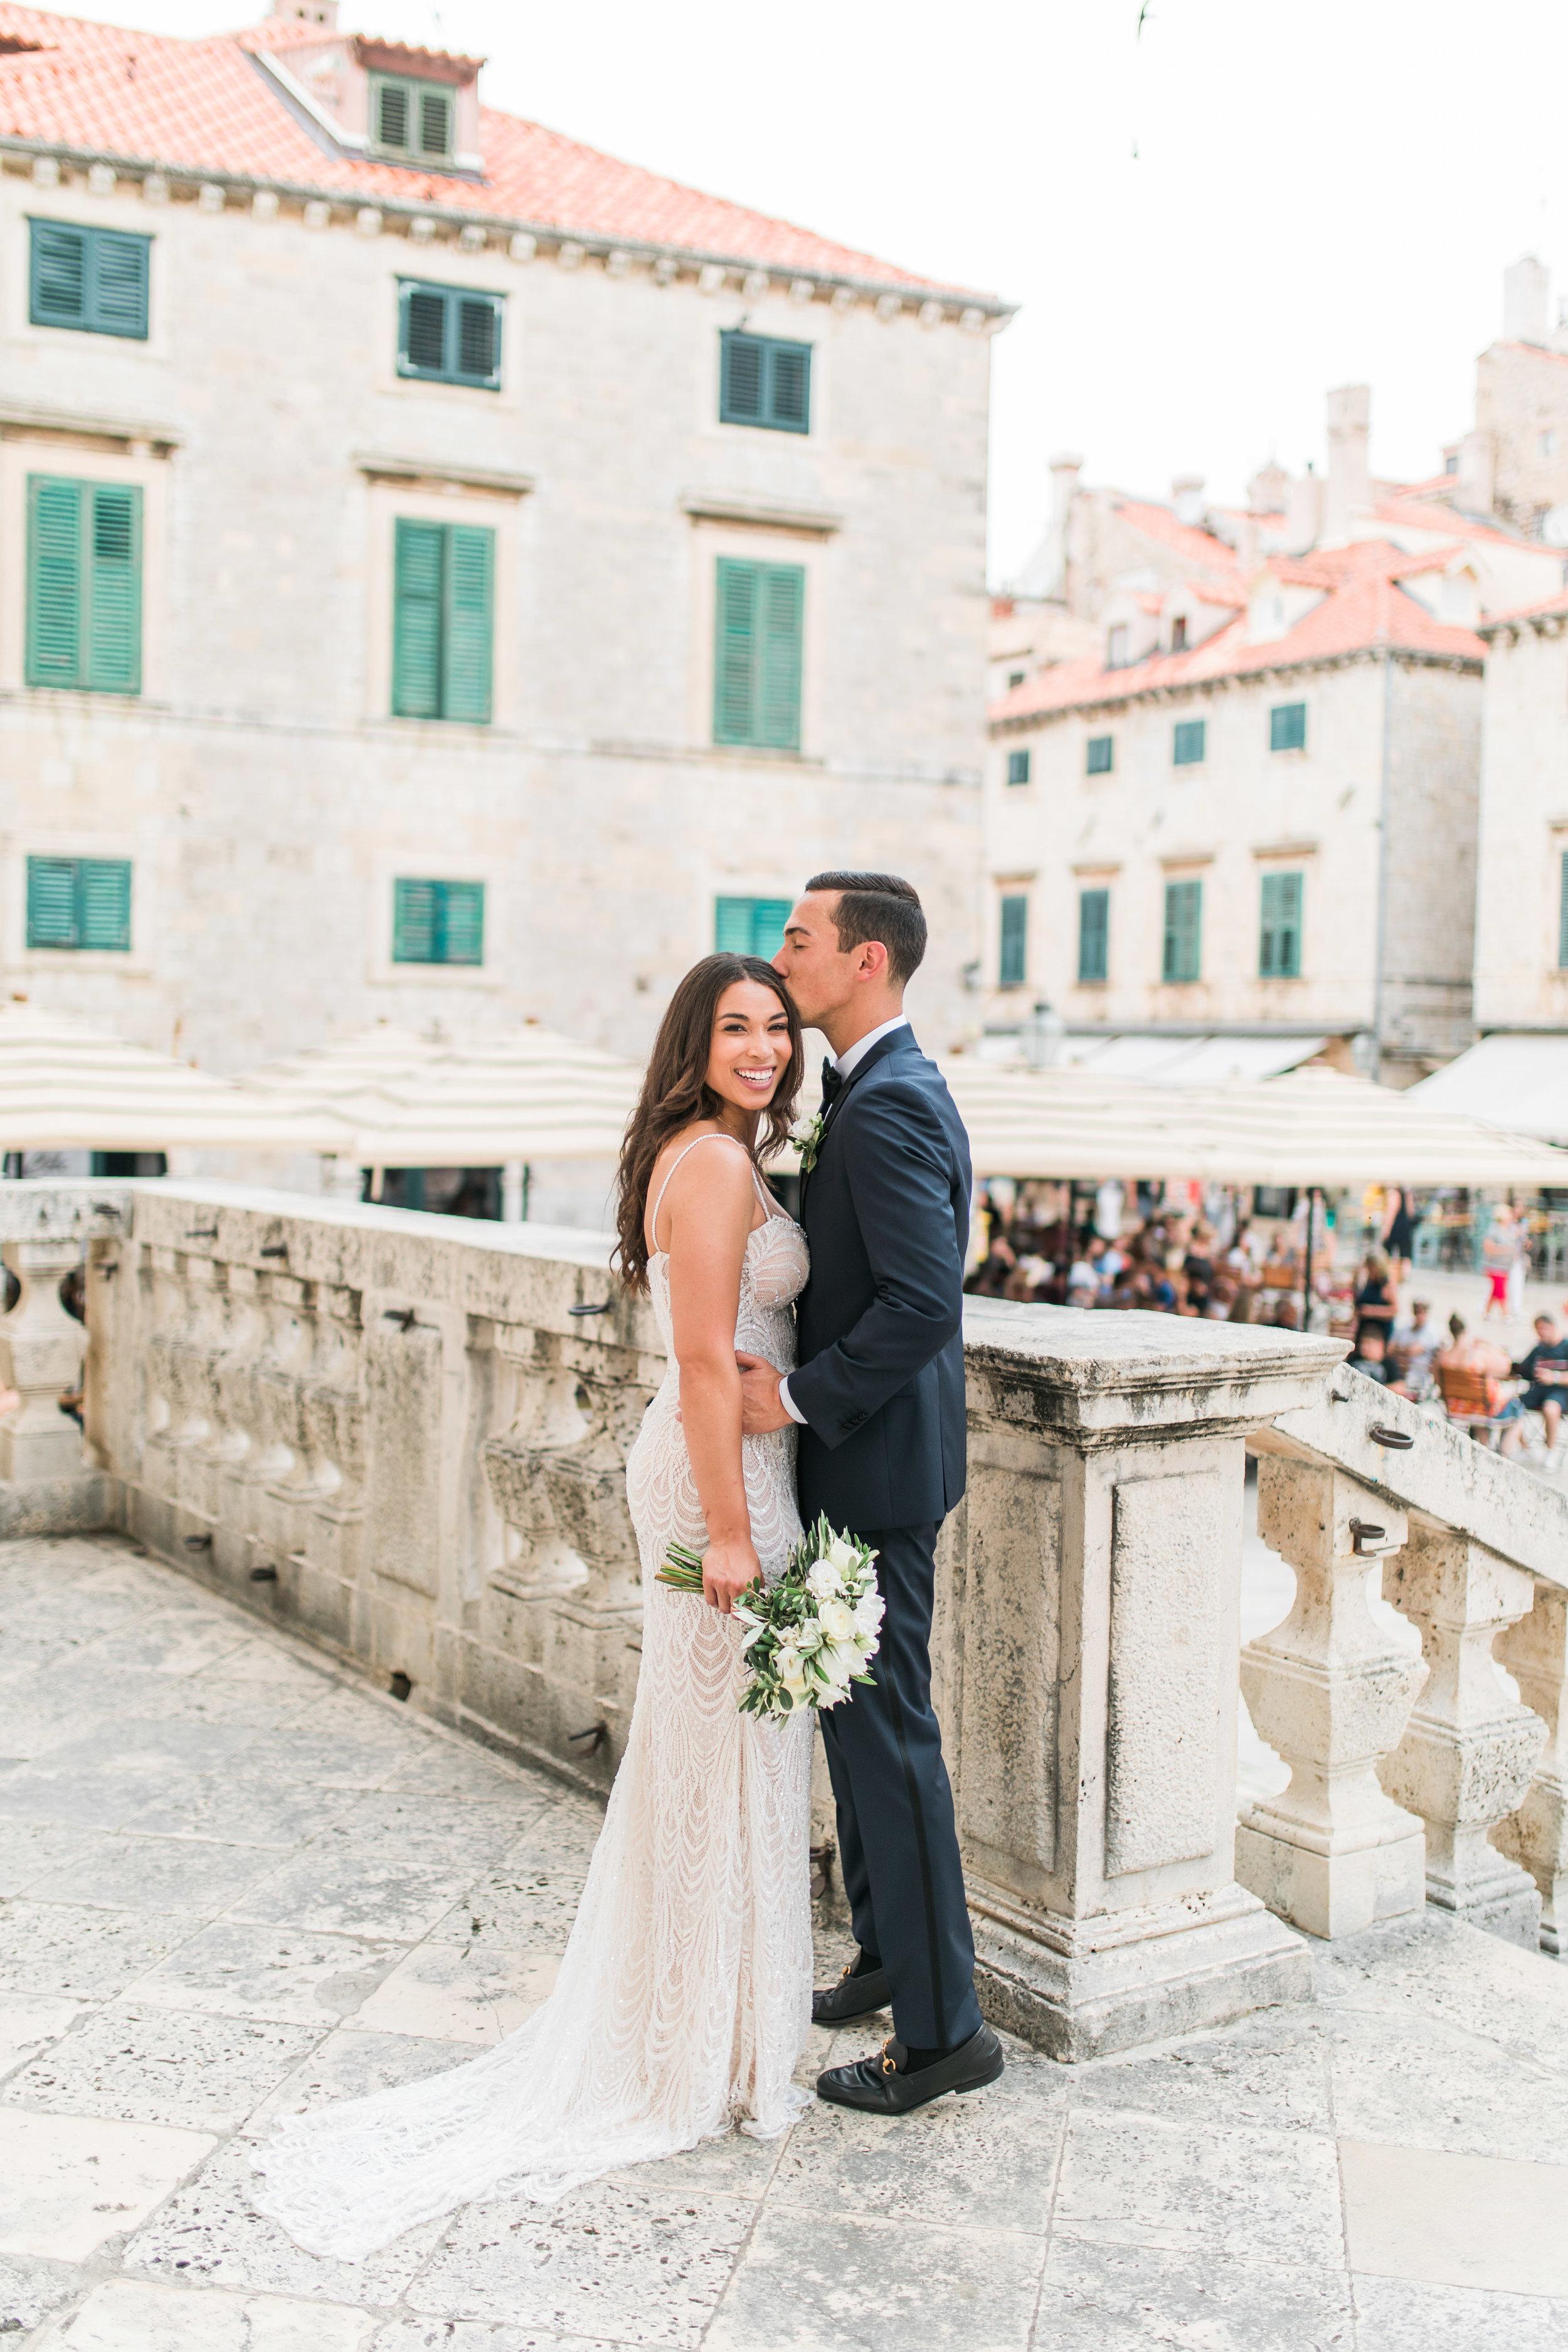 Dubrovnik-Wedding-Photographer-Croatia-Wedding-Photos-JBJ-Pictures-13.jpg